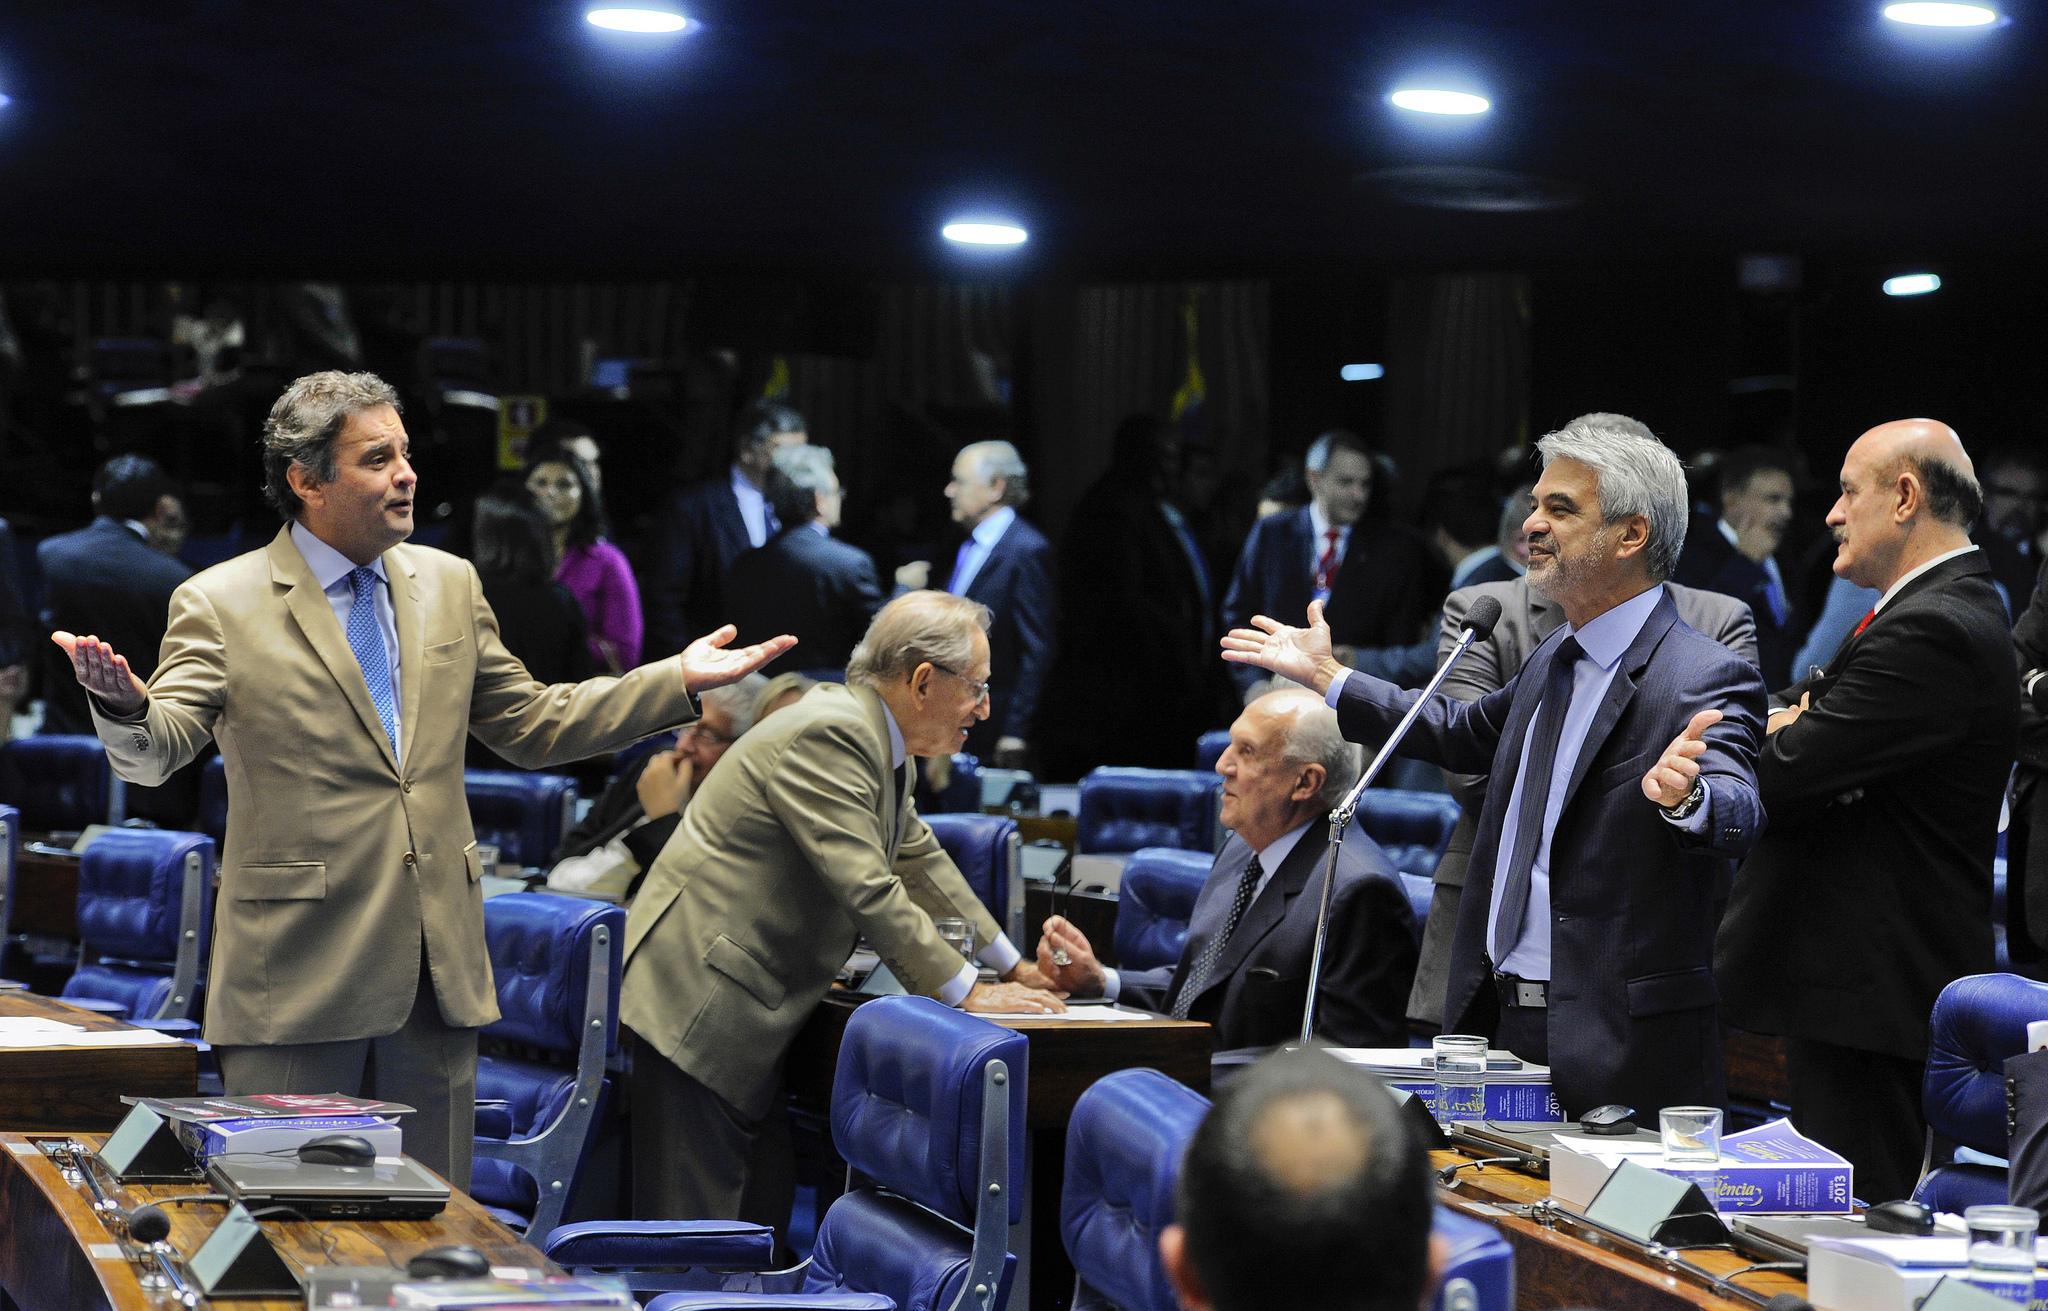 In this file photo of the Brazilian Senate, PSDB leader Aecio Neves is on the left. Credit: Pedro França/Agência Senado